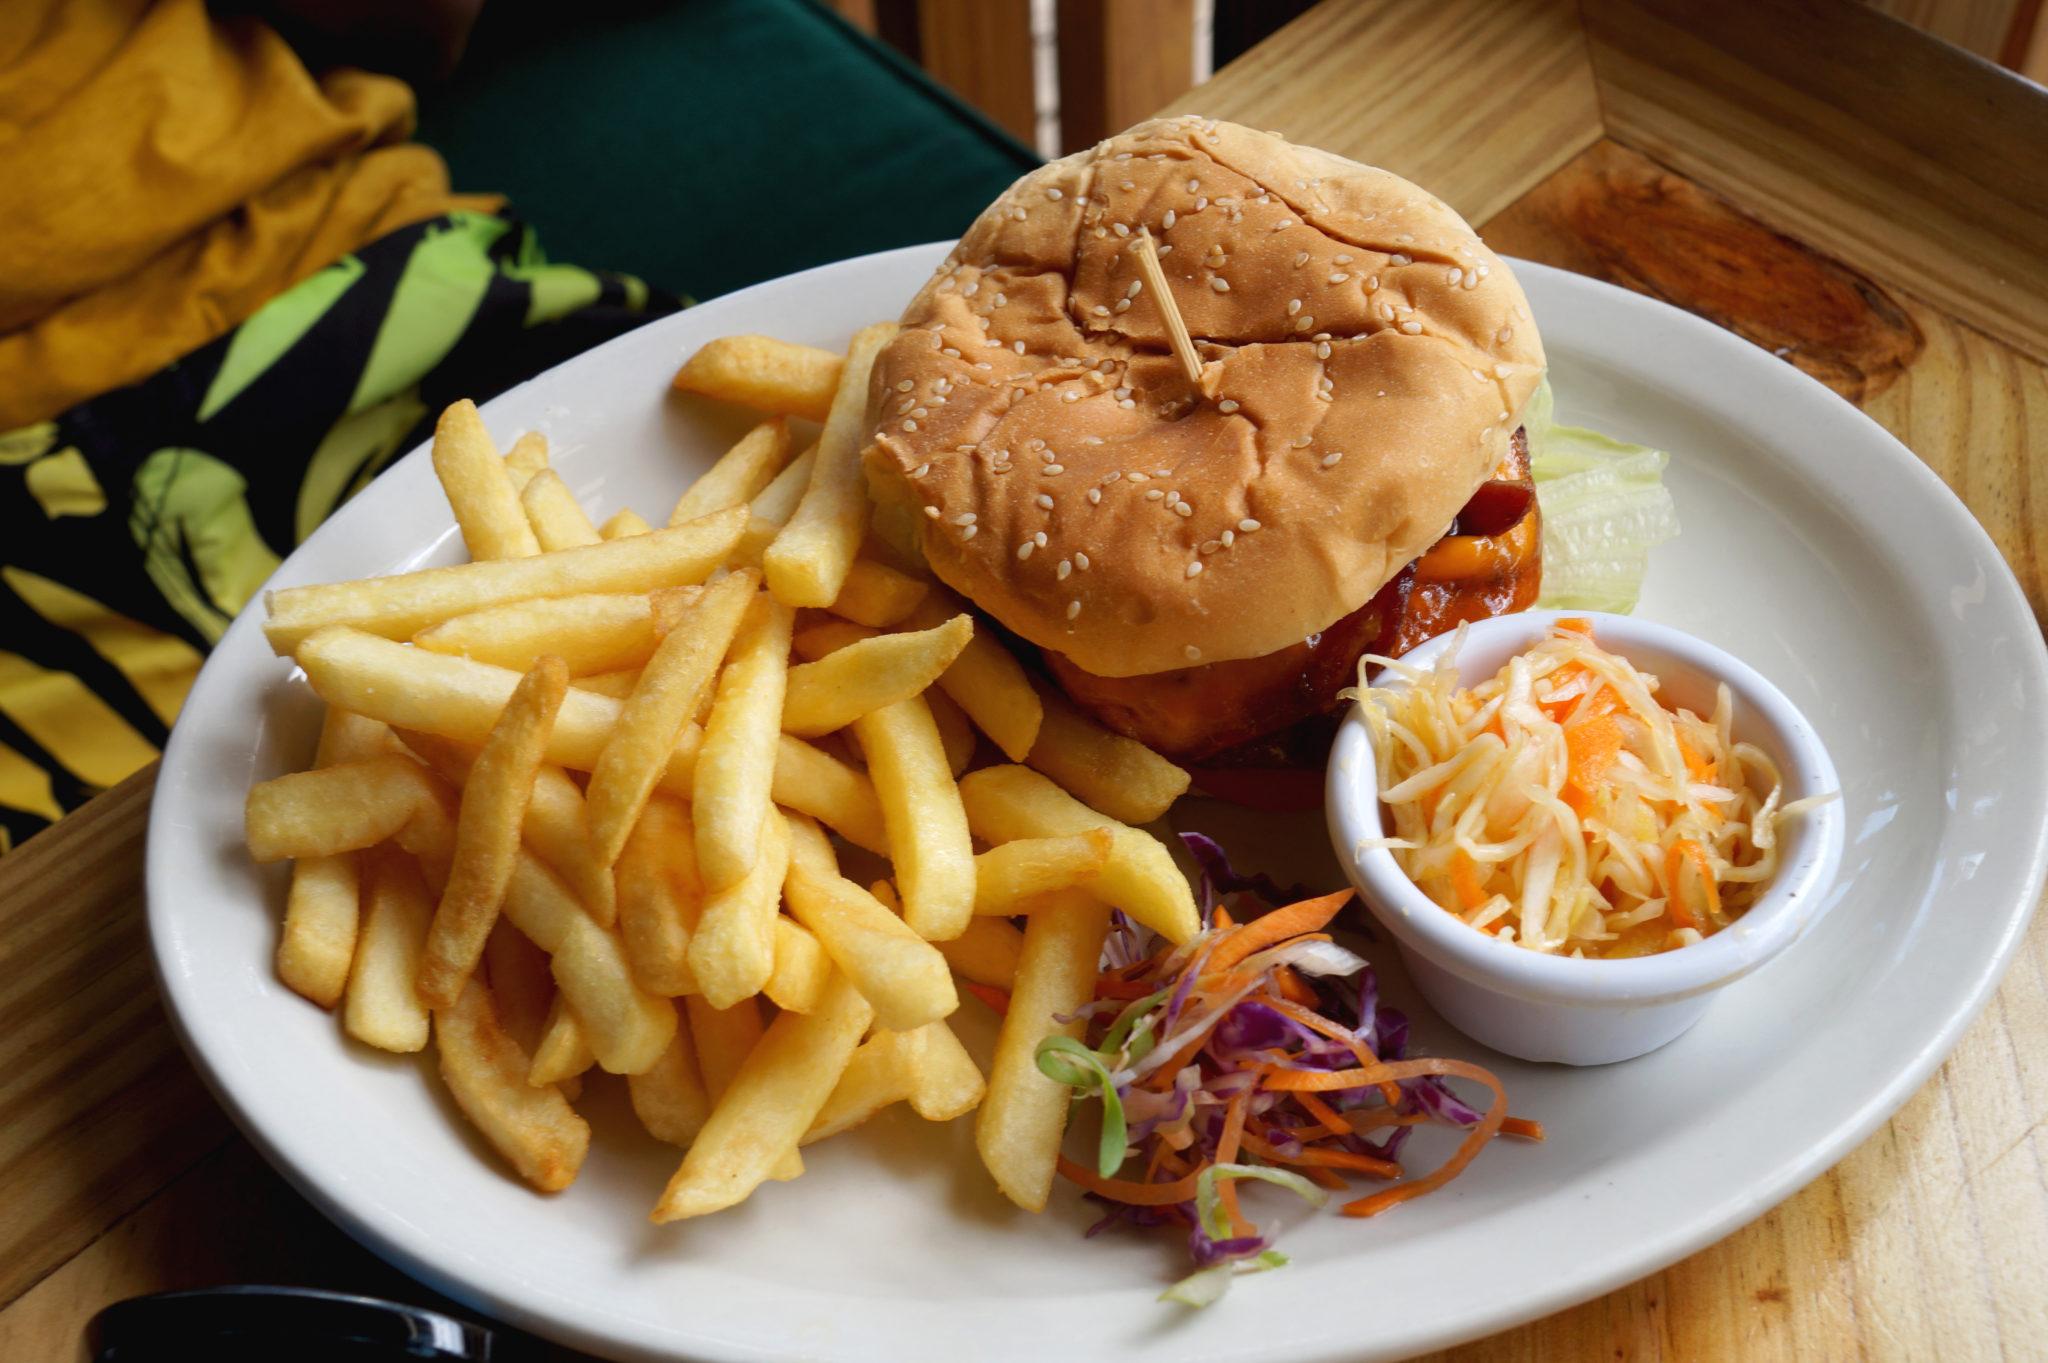 Republique_dominicaine_mes_bonnes_adresses_las_terrenas_restaurant_lazy_dog_beach_bar_grill_burger